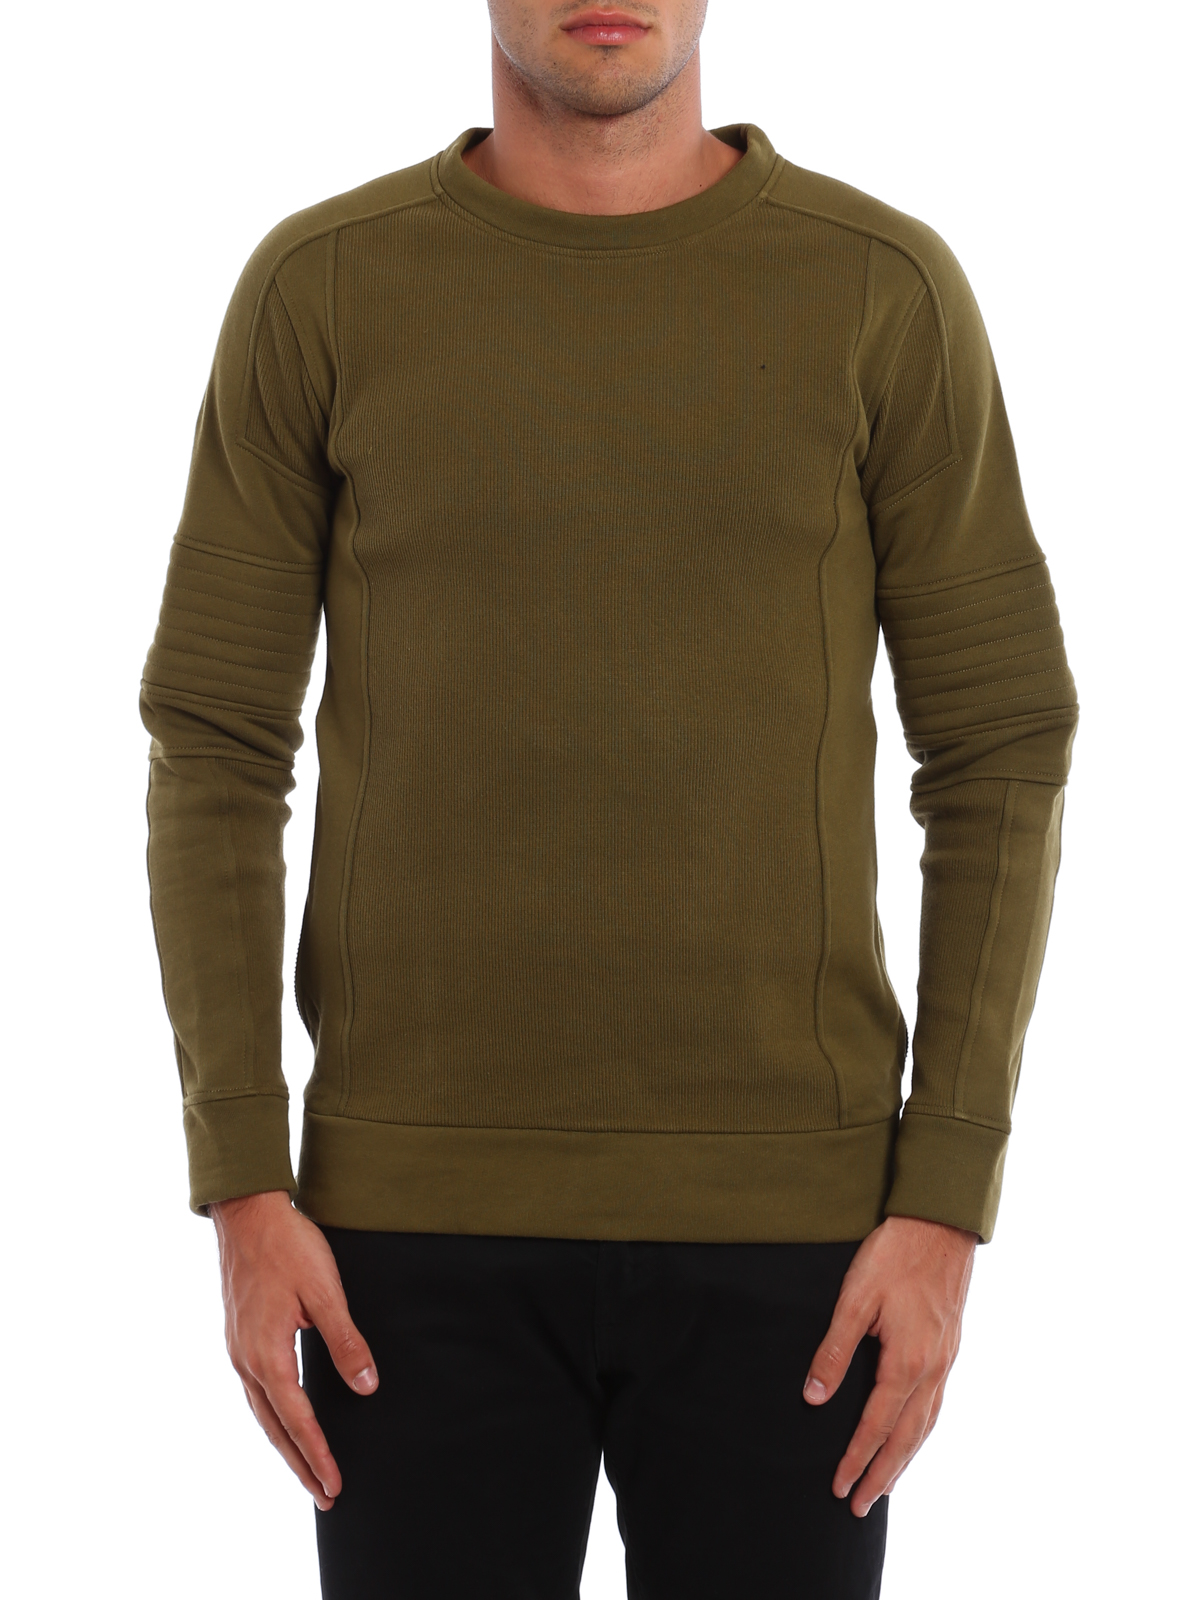 Biker-inspired cotton sweatshirt by Balmain - Sweatshirts ...